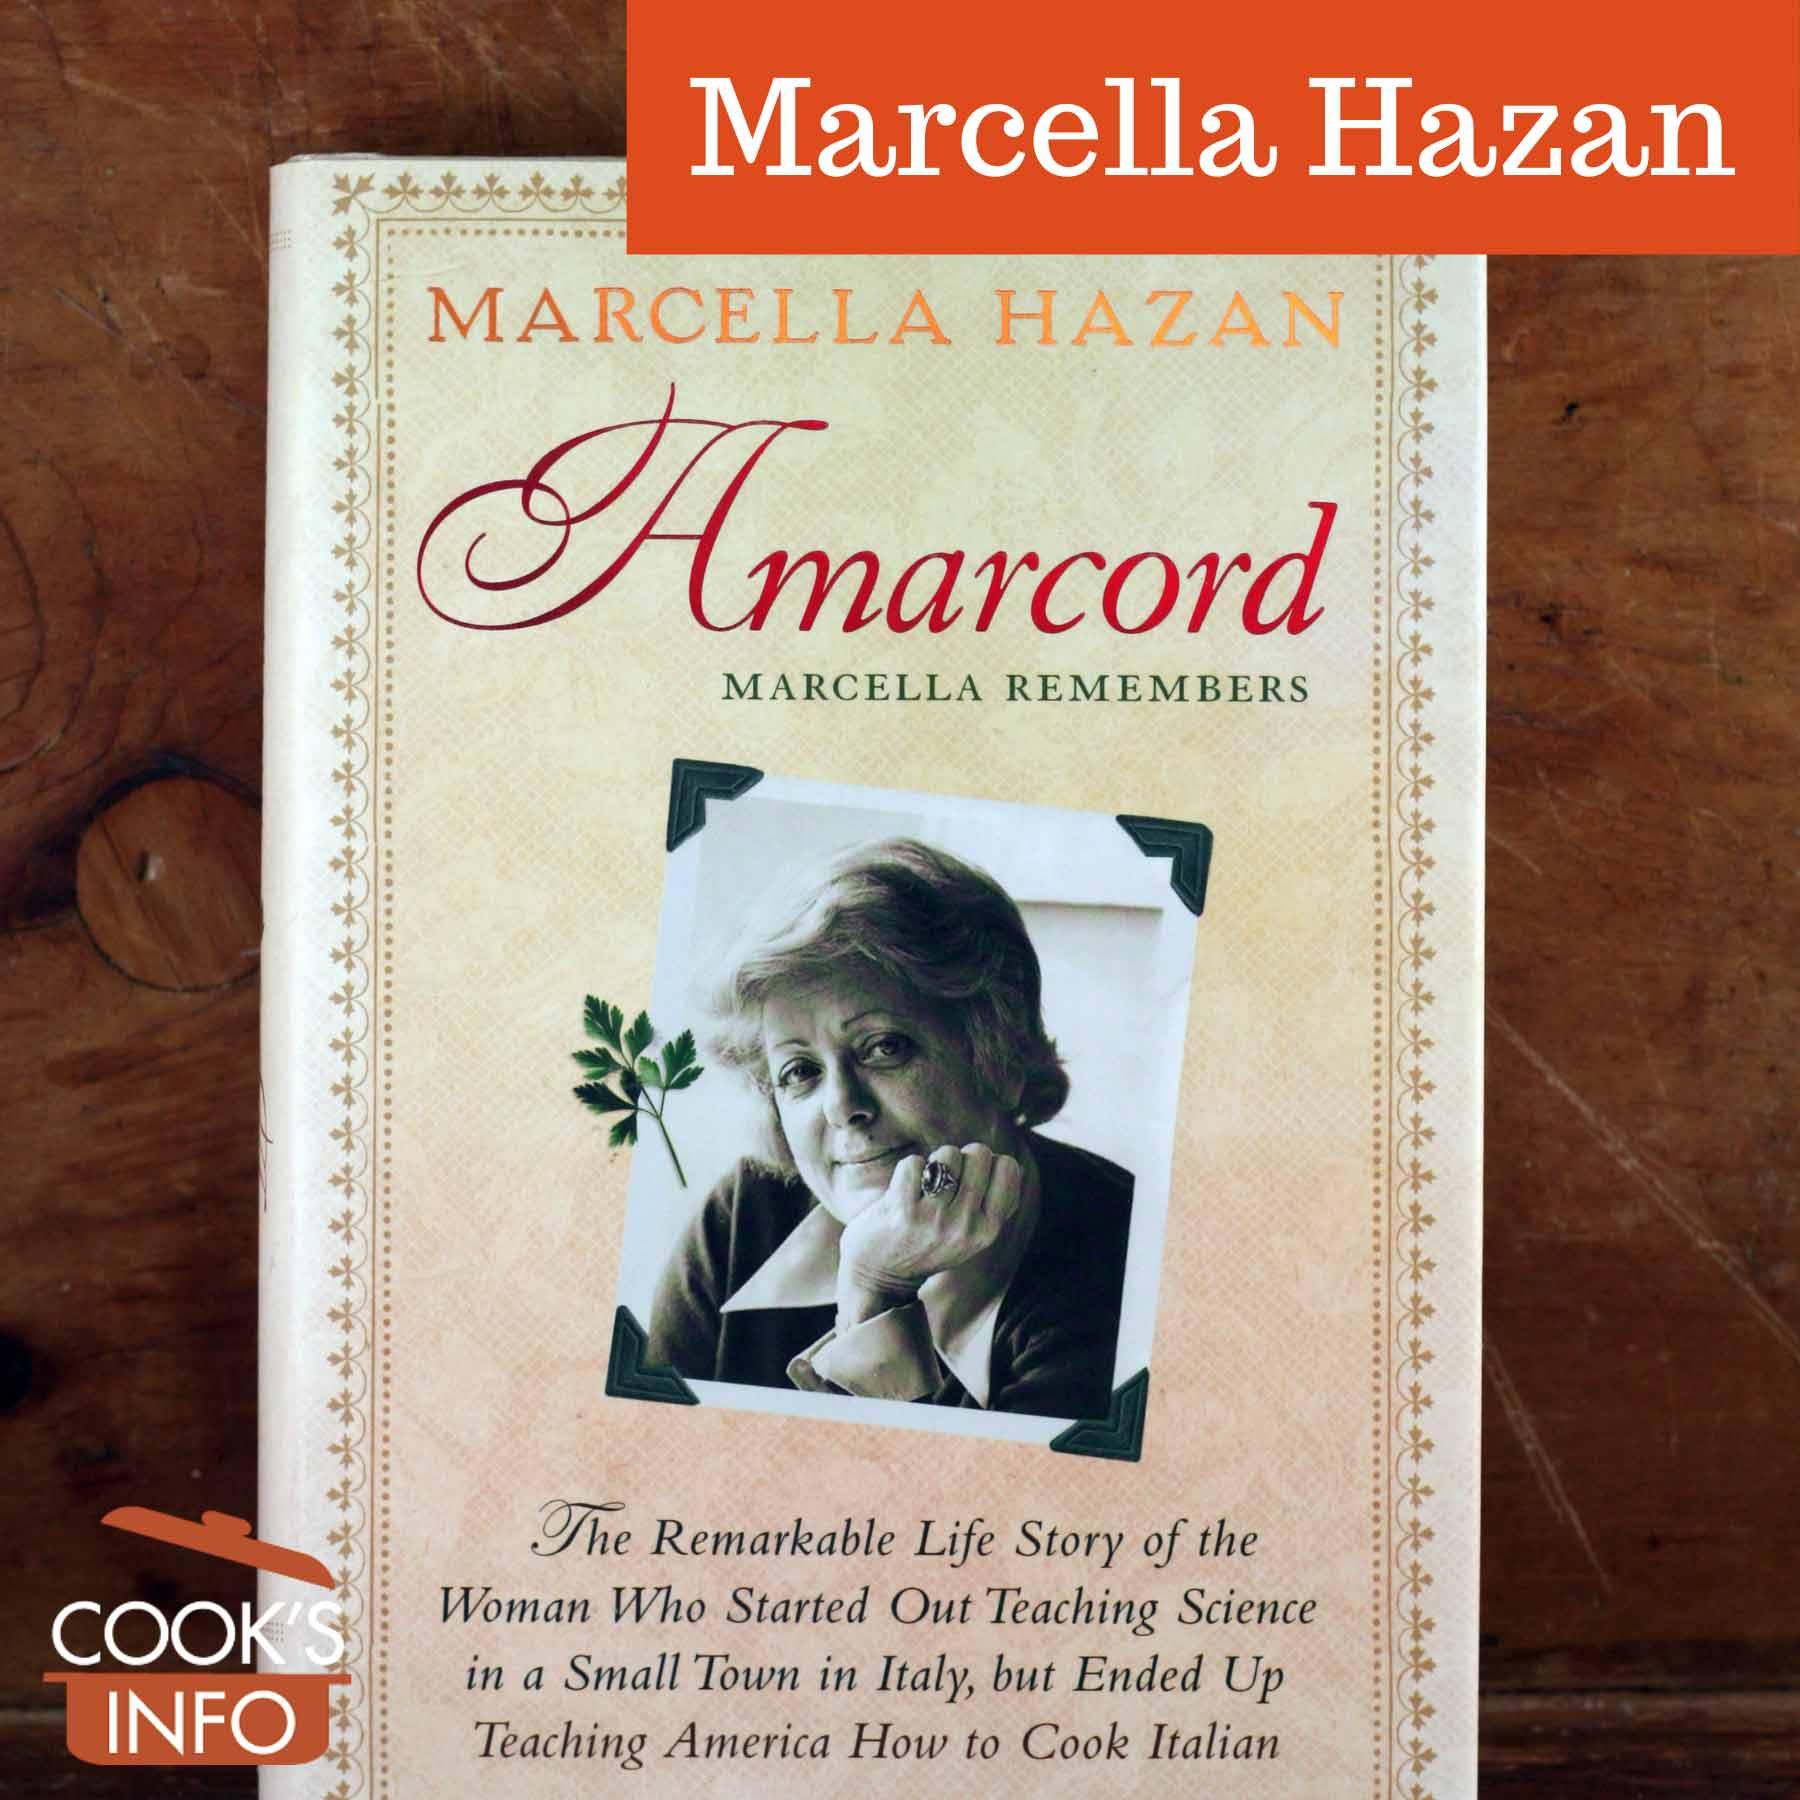 Marcella Hazan's book Amarcord